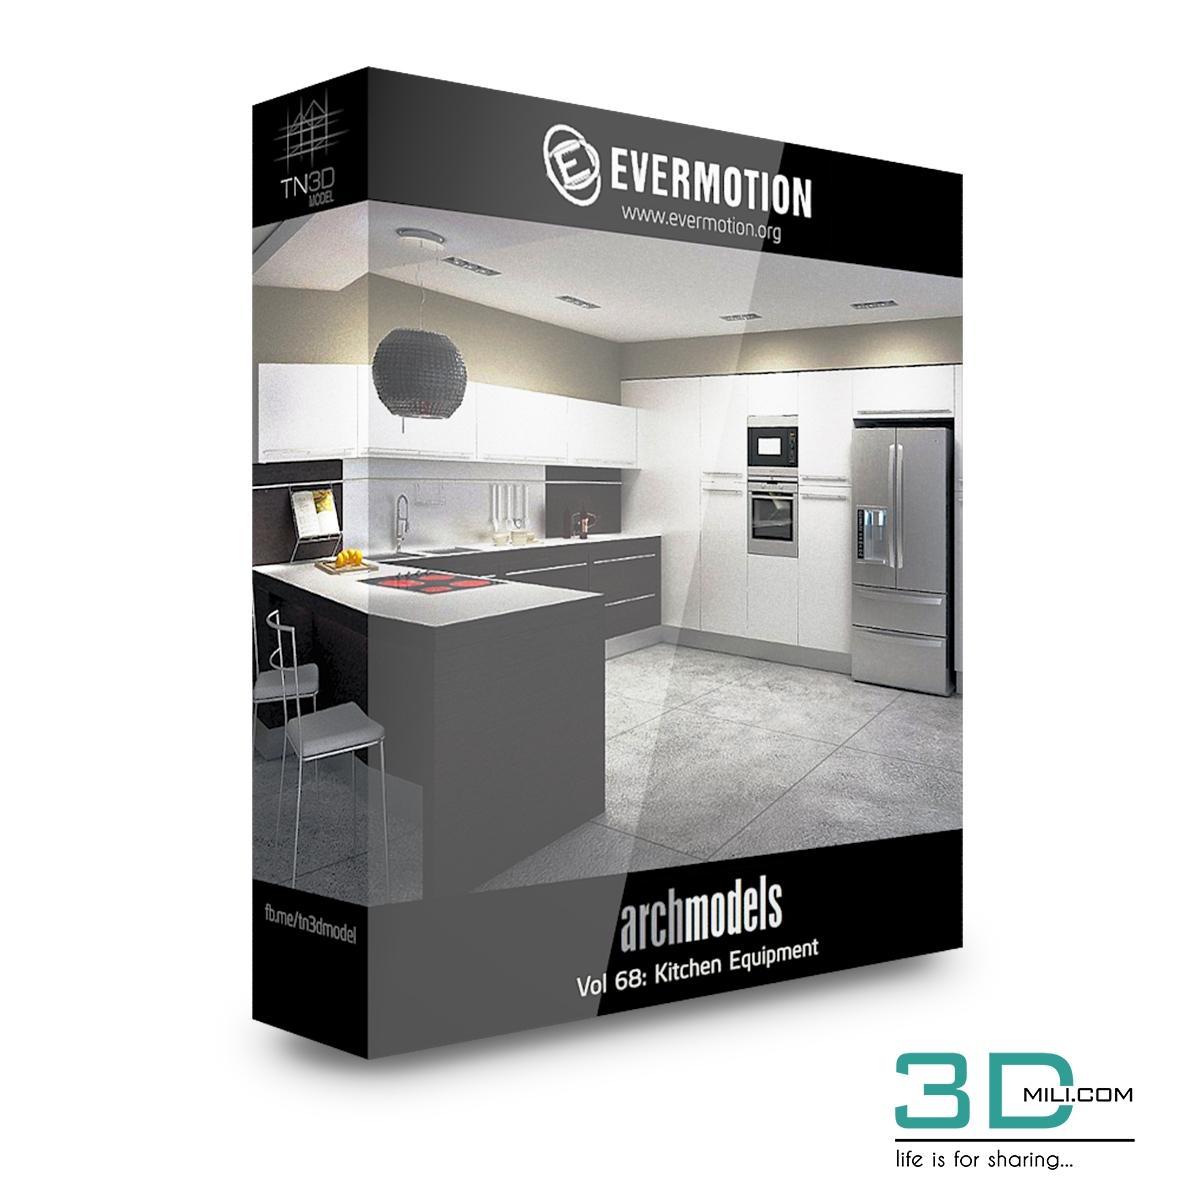 Evermotion Archmodels Vol 68: Kitchen Equipment - 3D Mili - Download